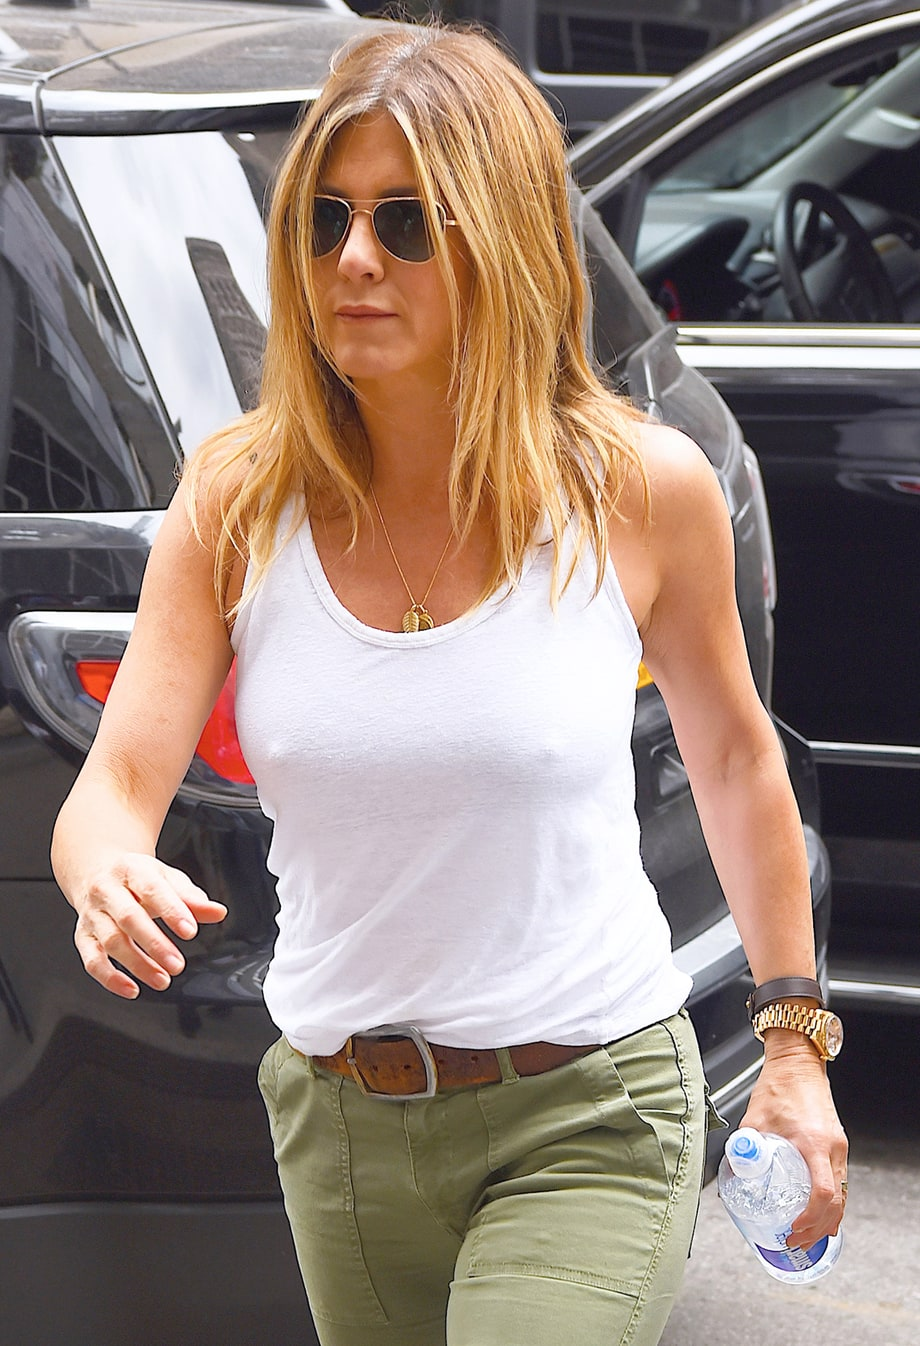 Ass Fappening Jennifer Aniston naked photo 2017